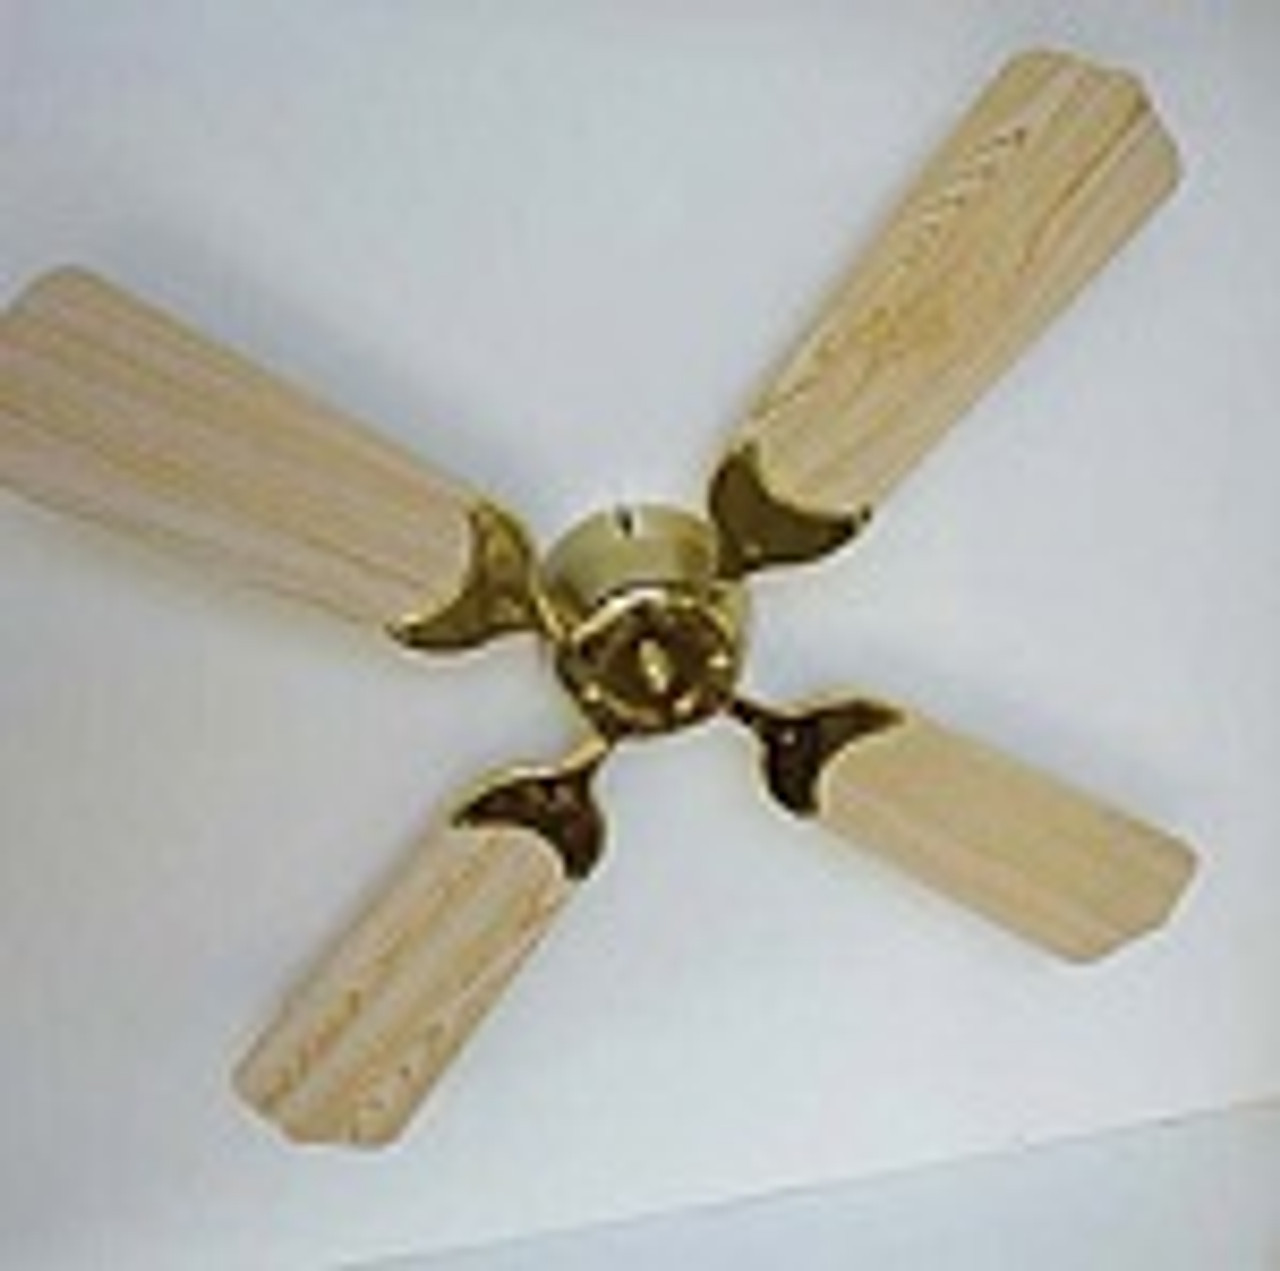 Wood grain colored blades